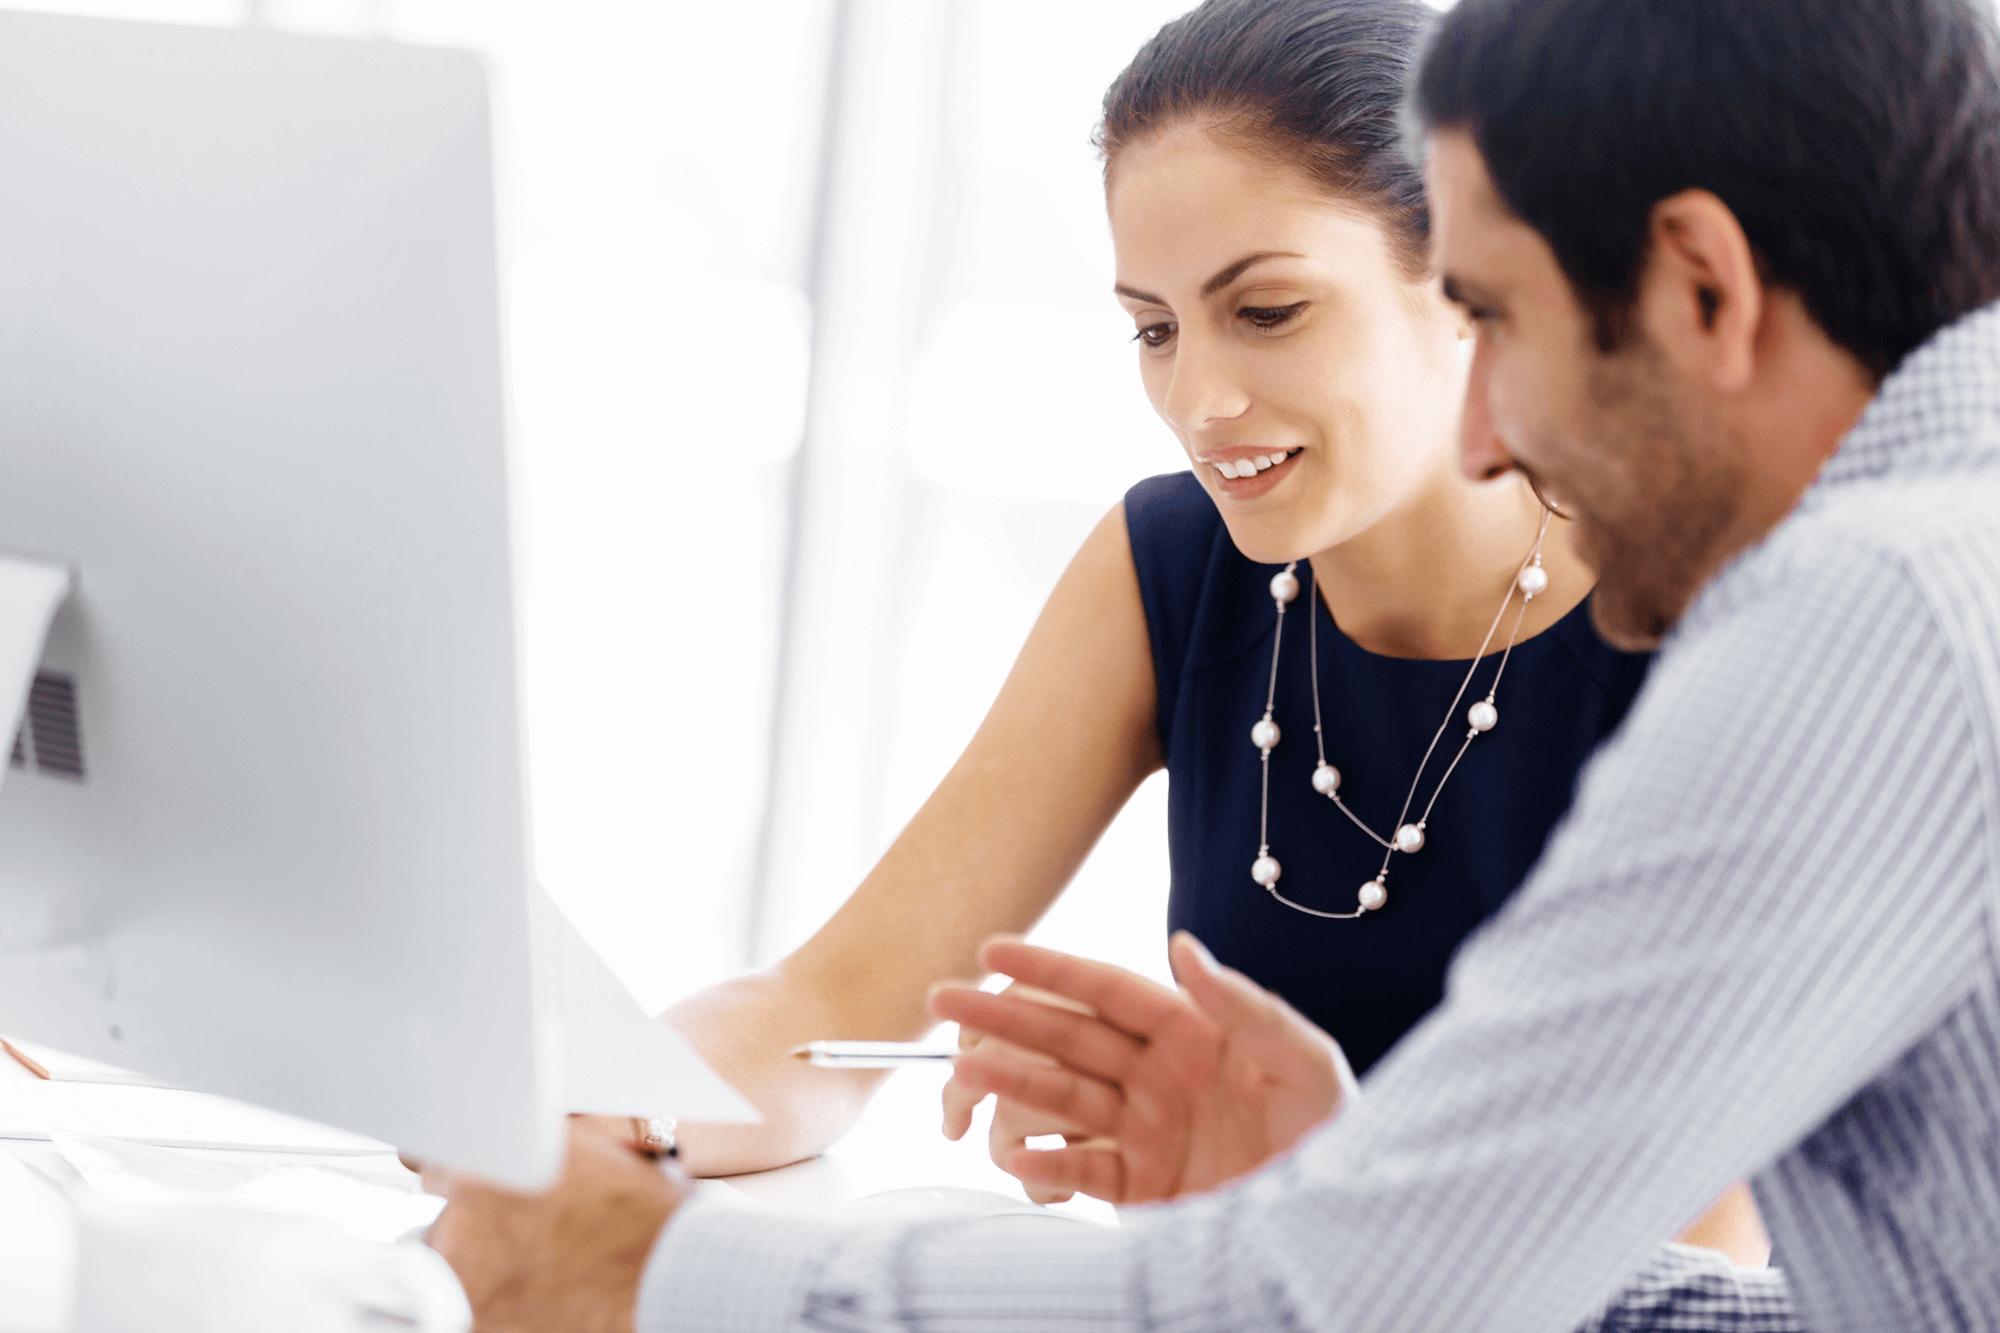 Business Intelligence roadmap | Business Analytics vision | 4 steps